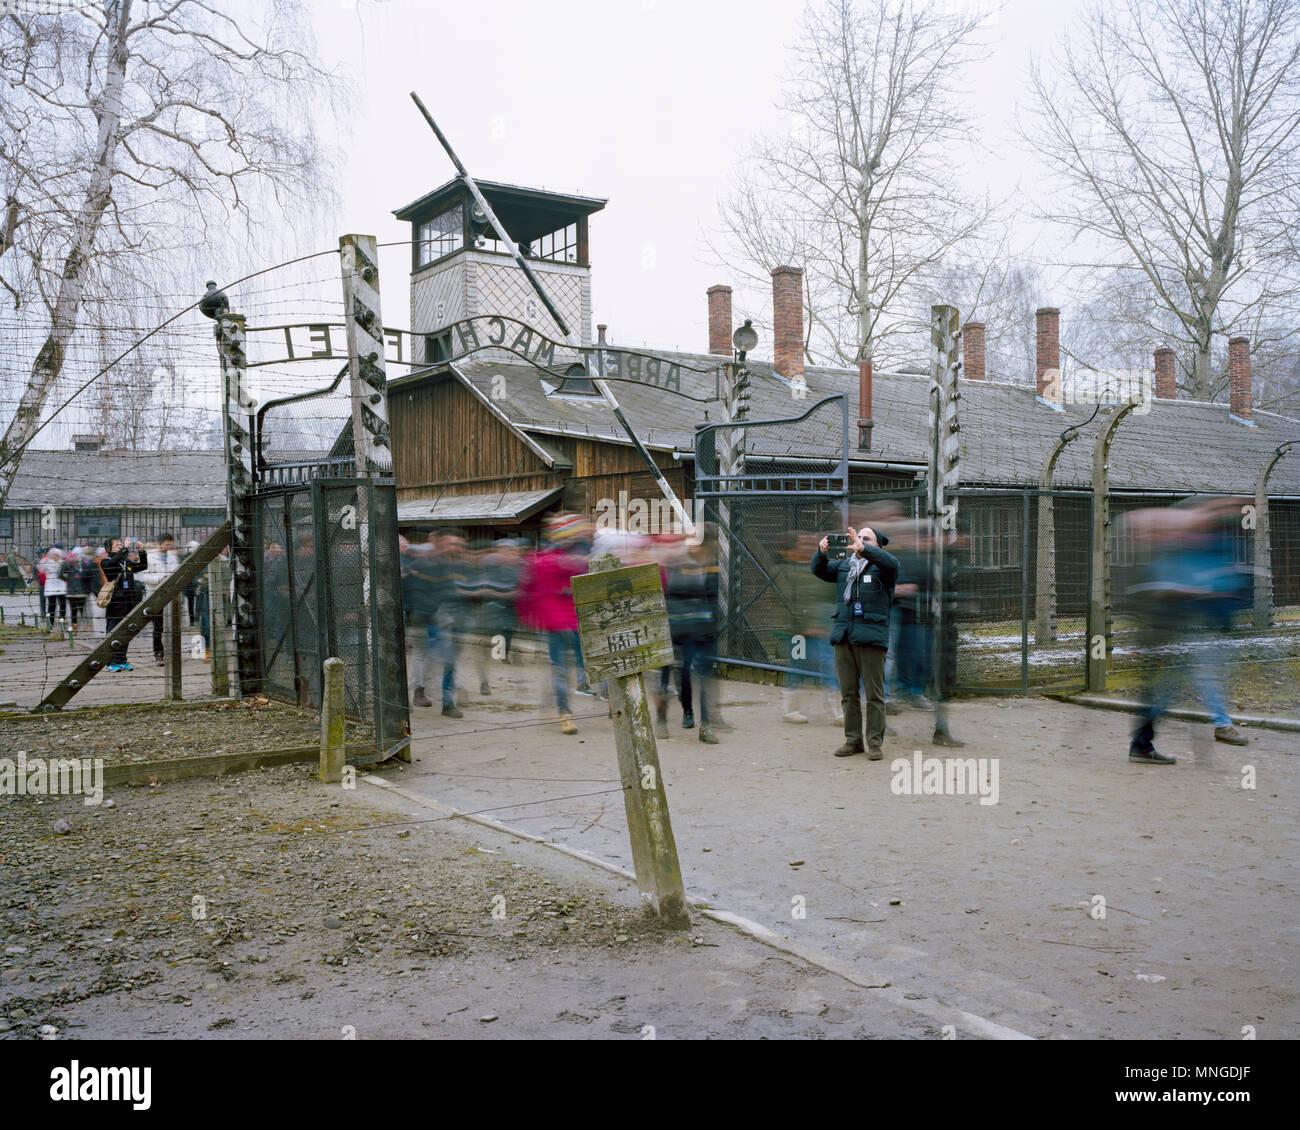 Foto John angerson Befreit am 27. Januar 1945. Auschwitz II Birkenau concentration camp in Süd- West Polen Stockbild